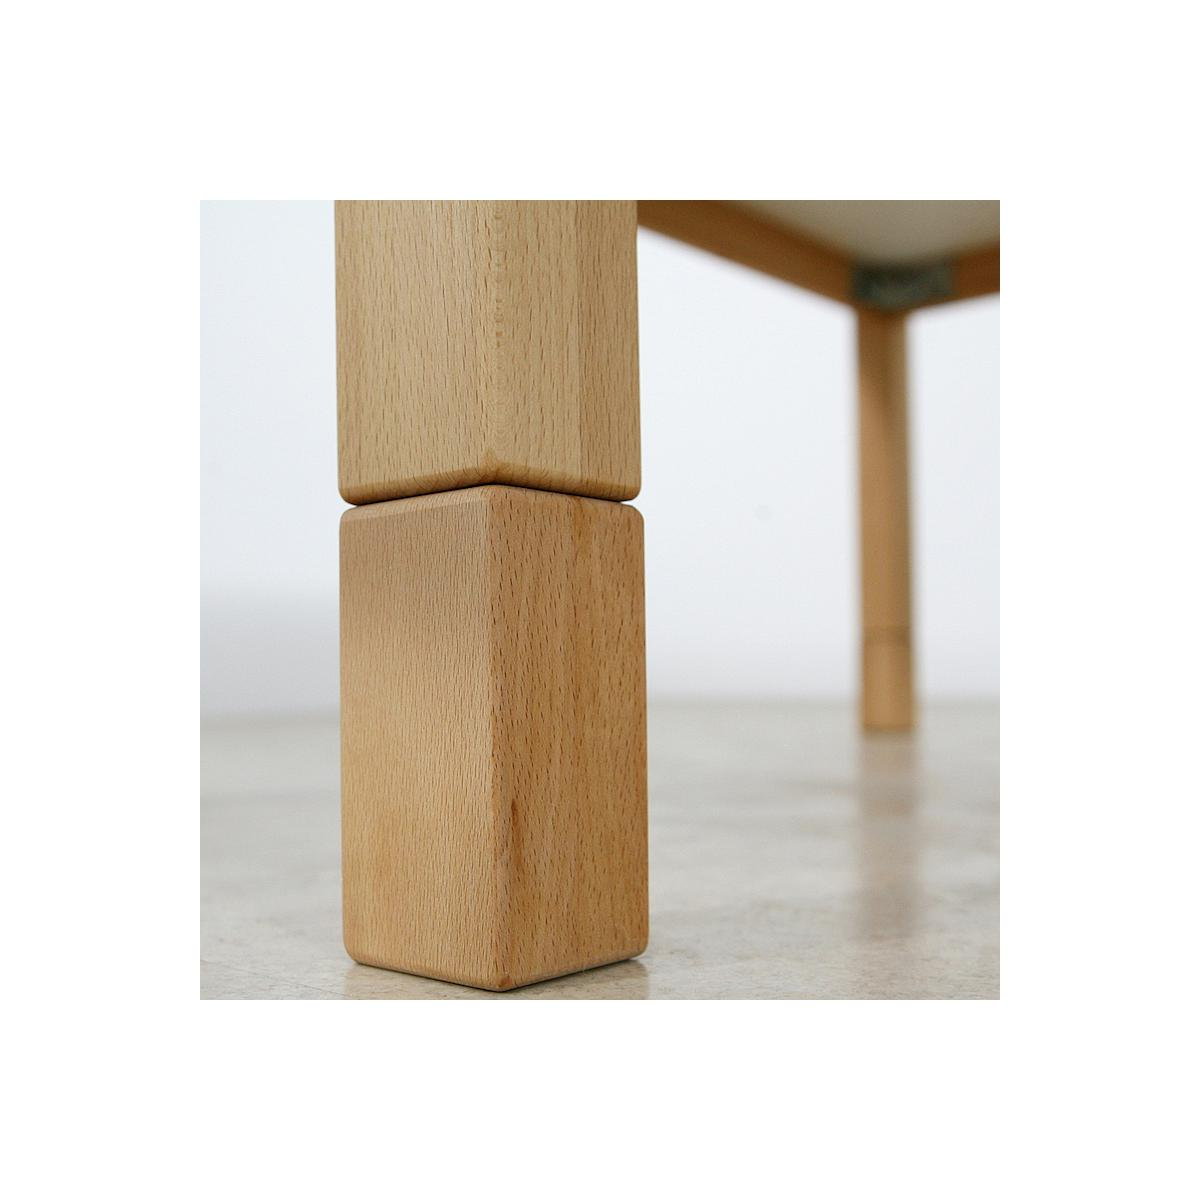 Kindertisch DETAIL Debreuyn 60x90cm Buche massiv-natur geölt